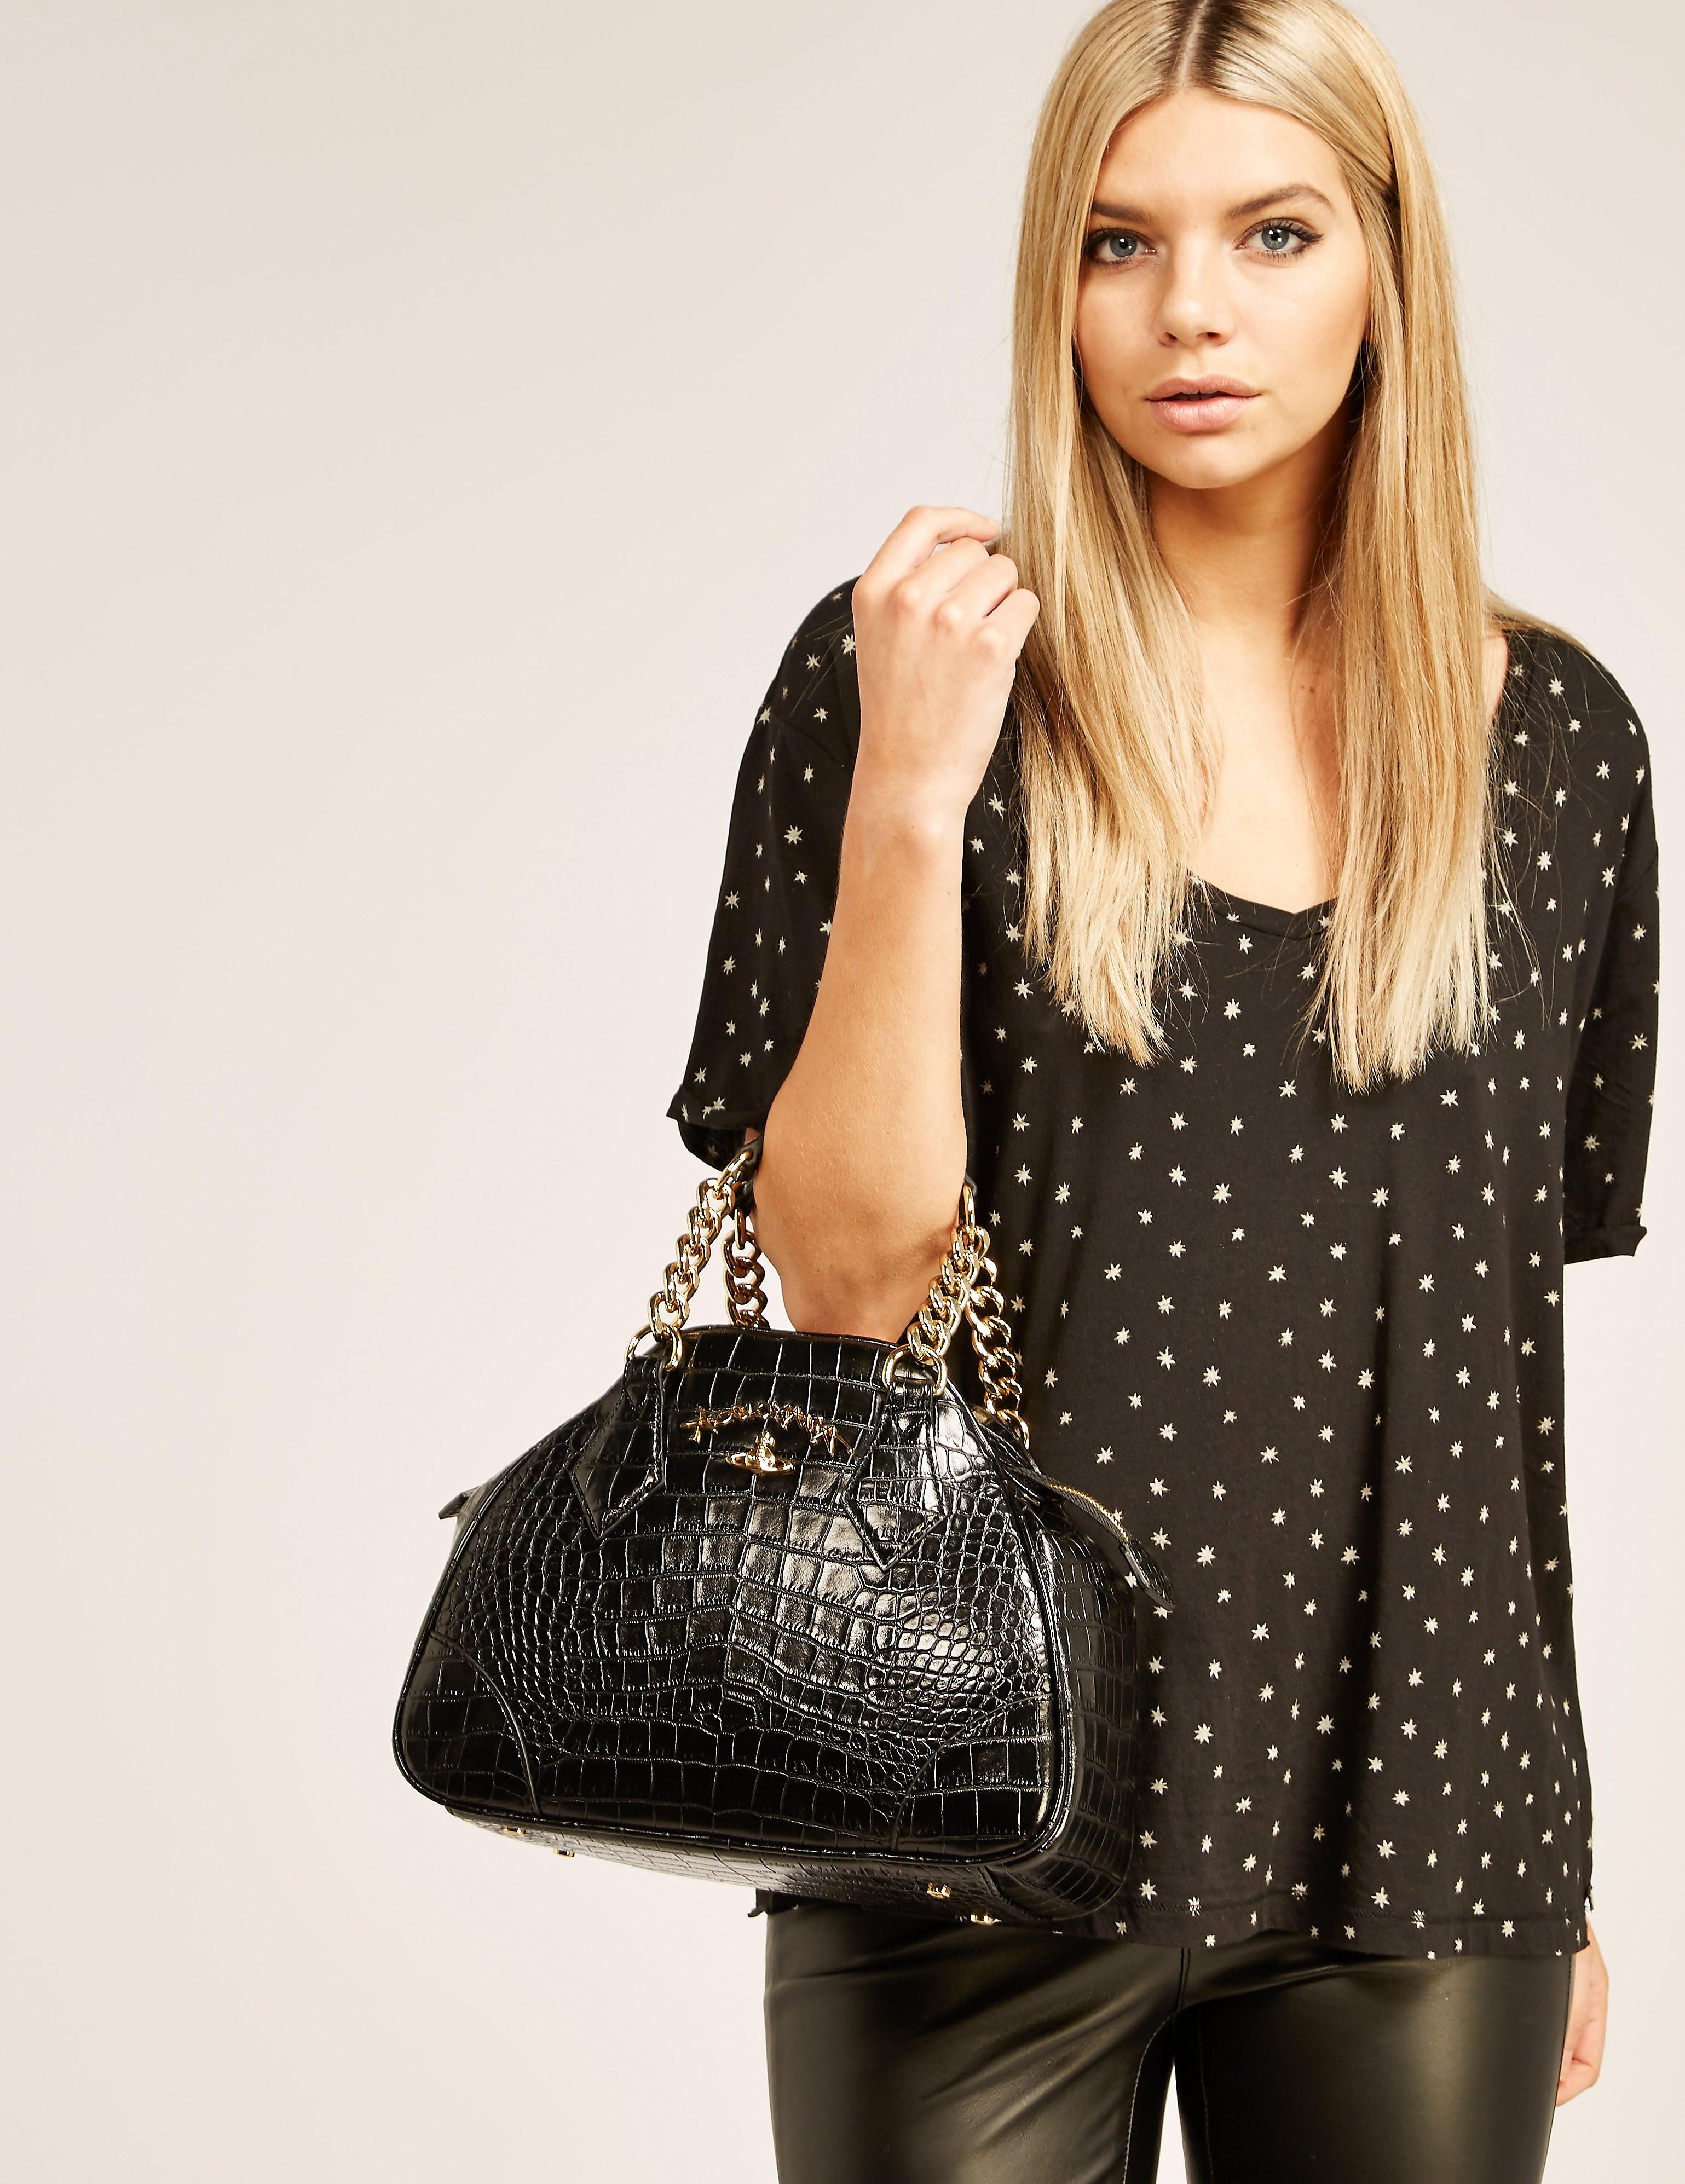 Vivienne Westwood Dorset Crocodile Skin Handbag